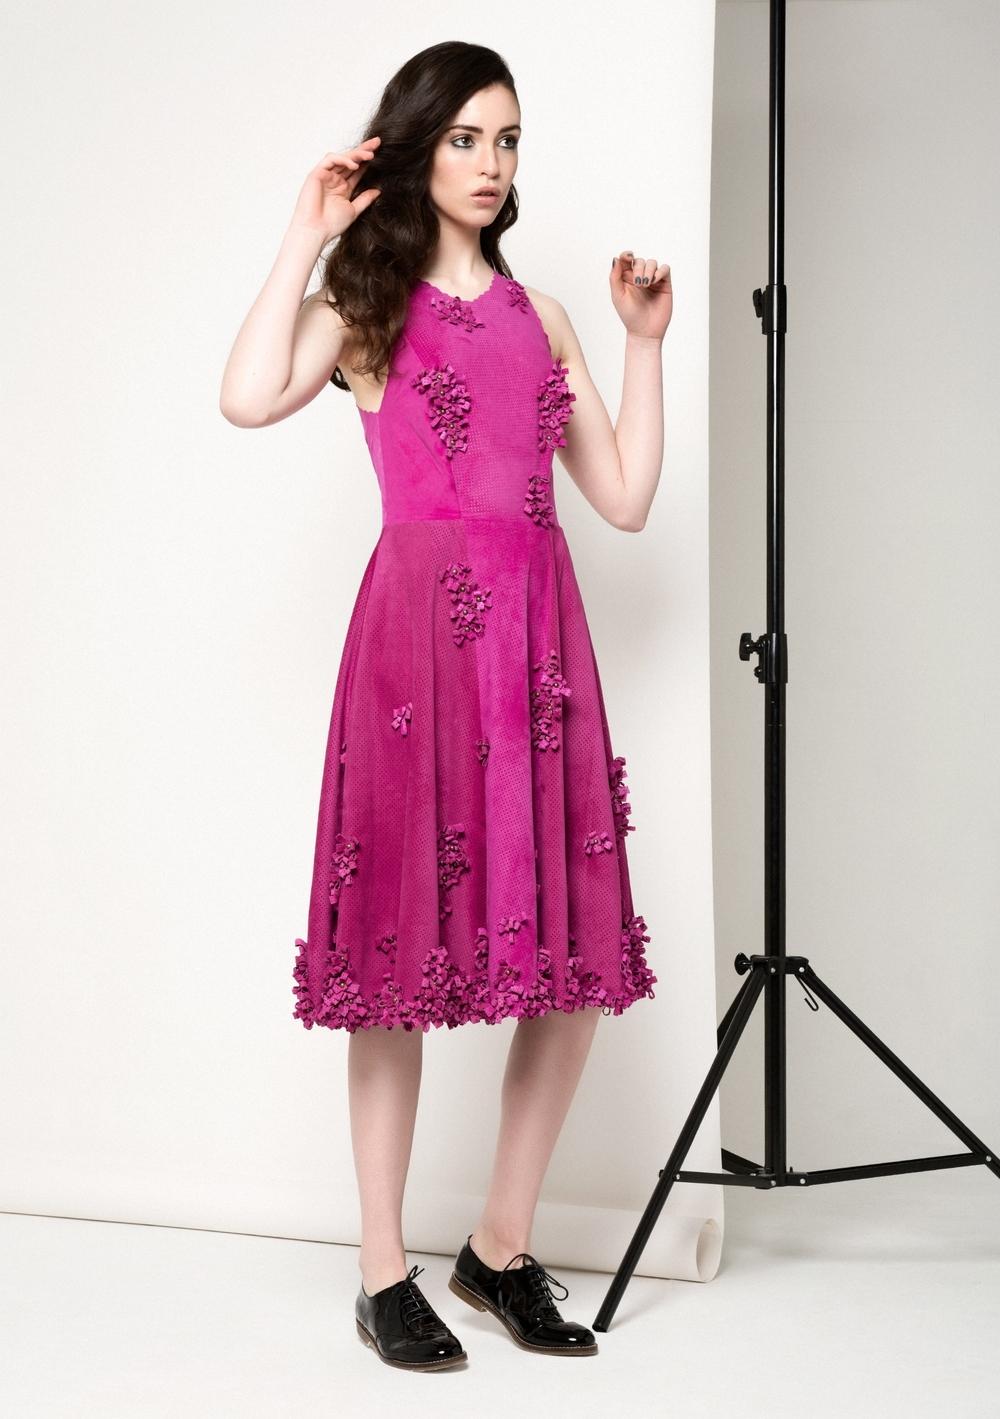 Carly Bow Dress